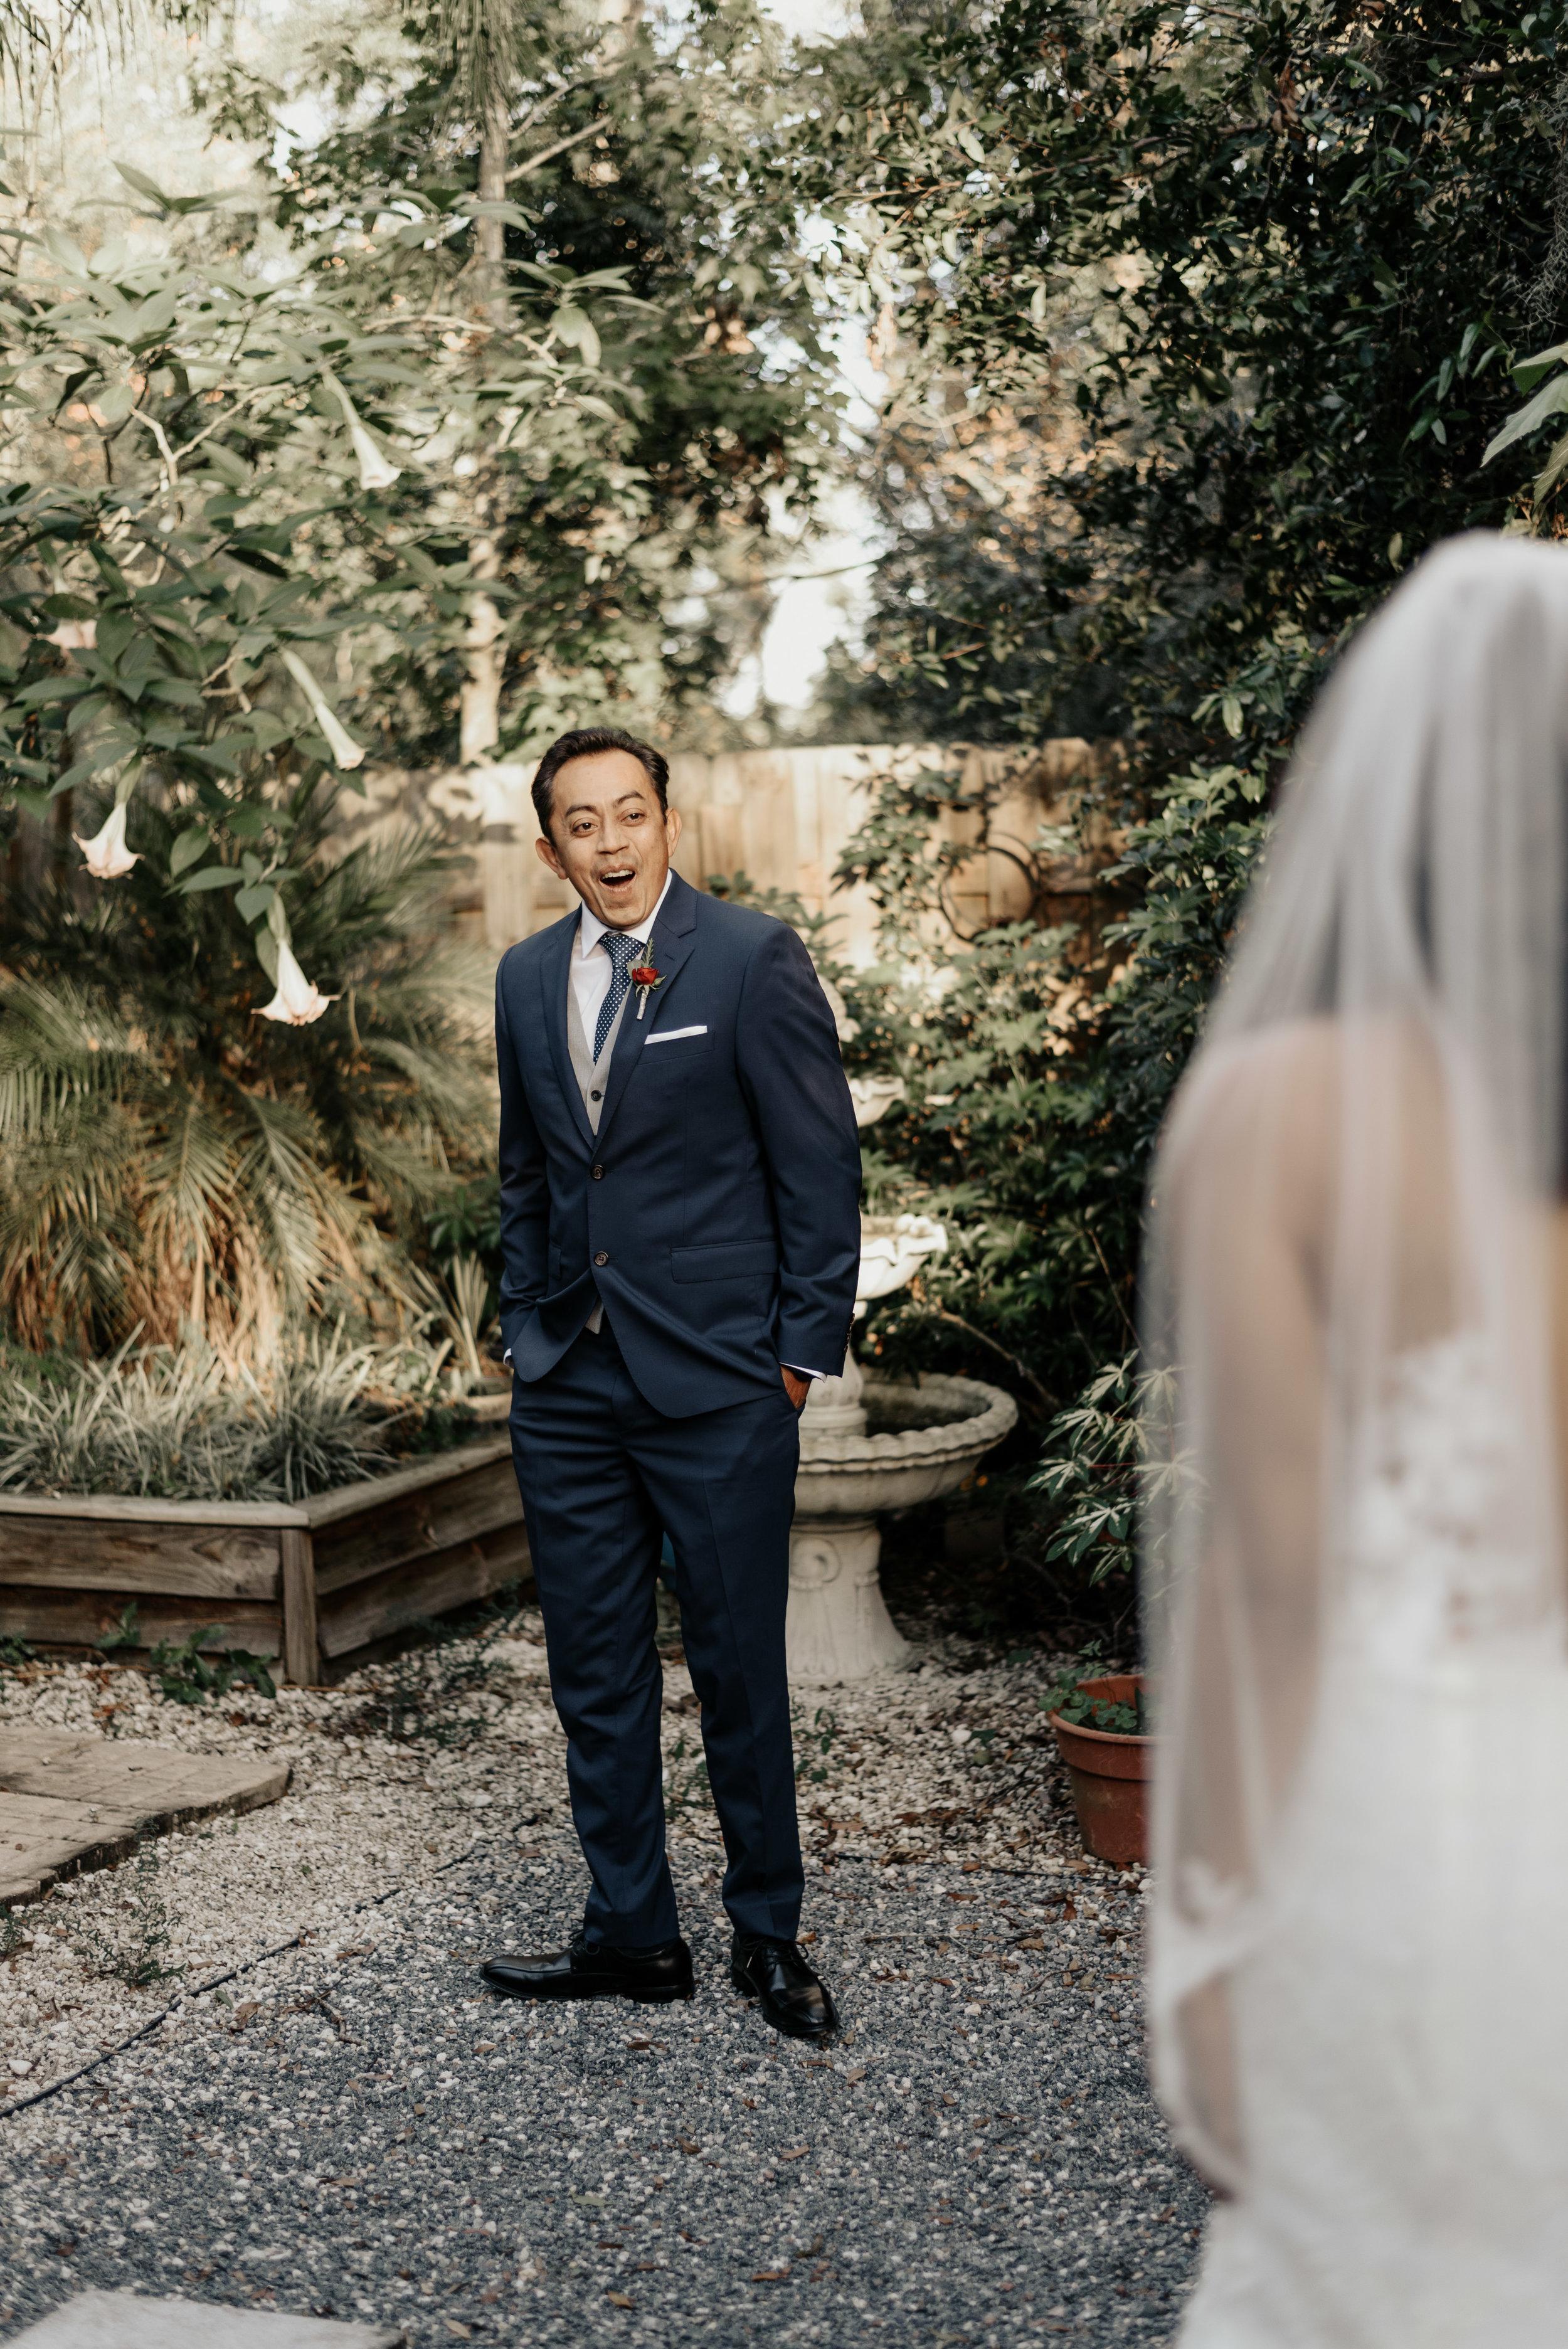 Kirstie-AJ-Wedding-8651.jpg